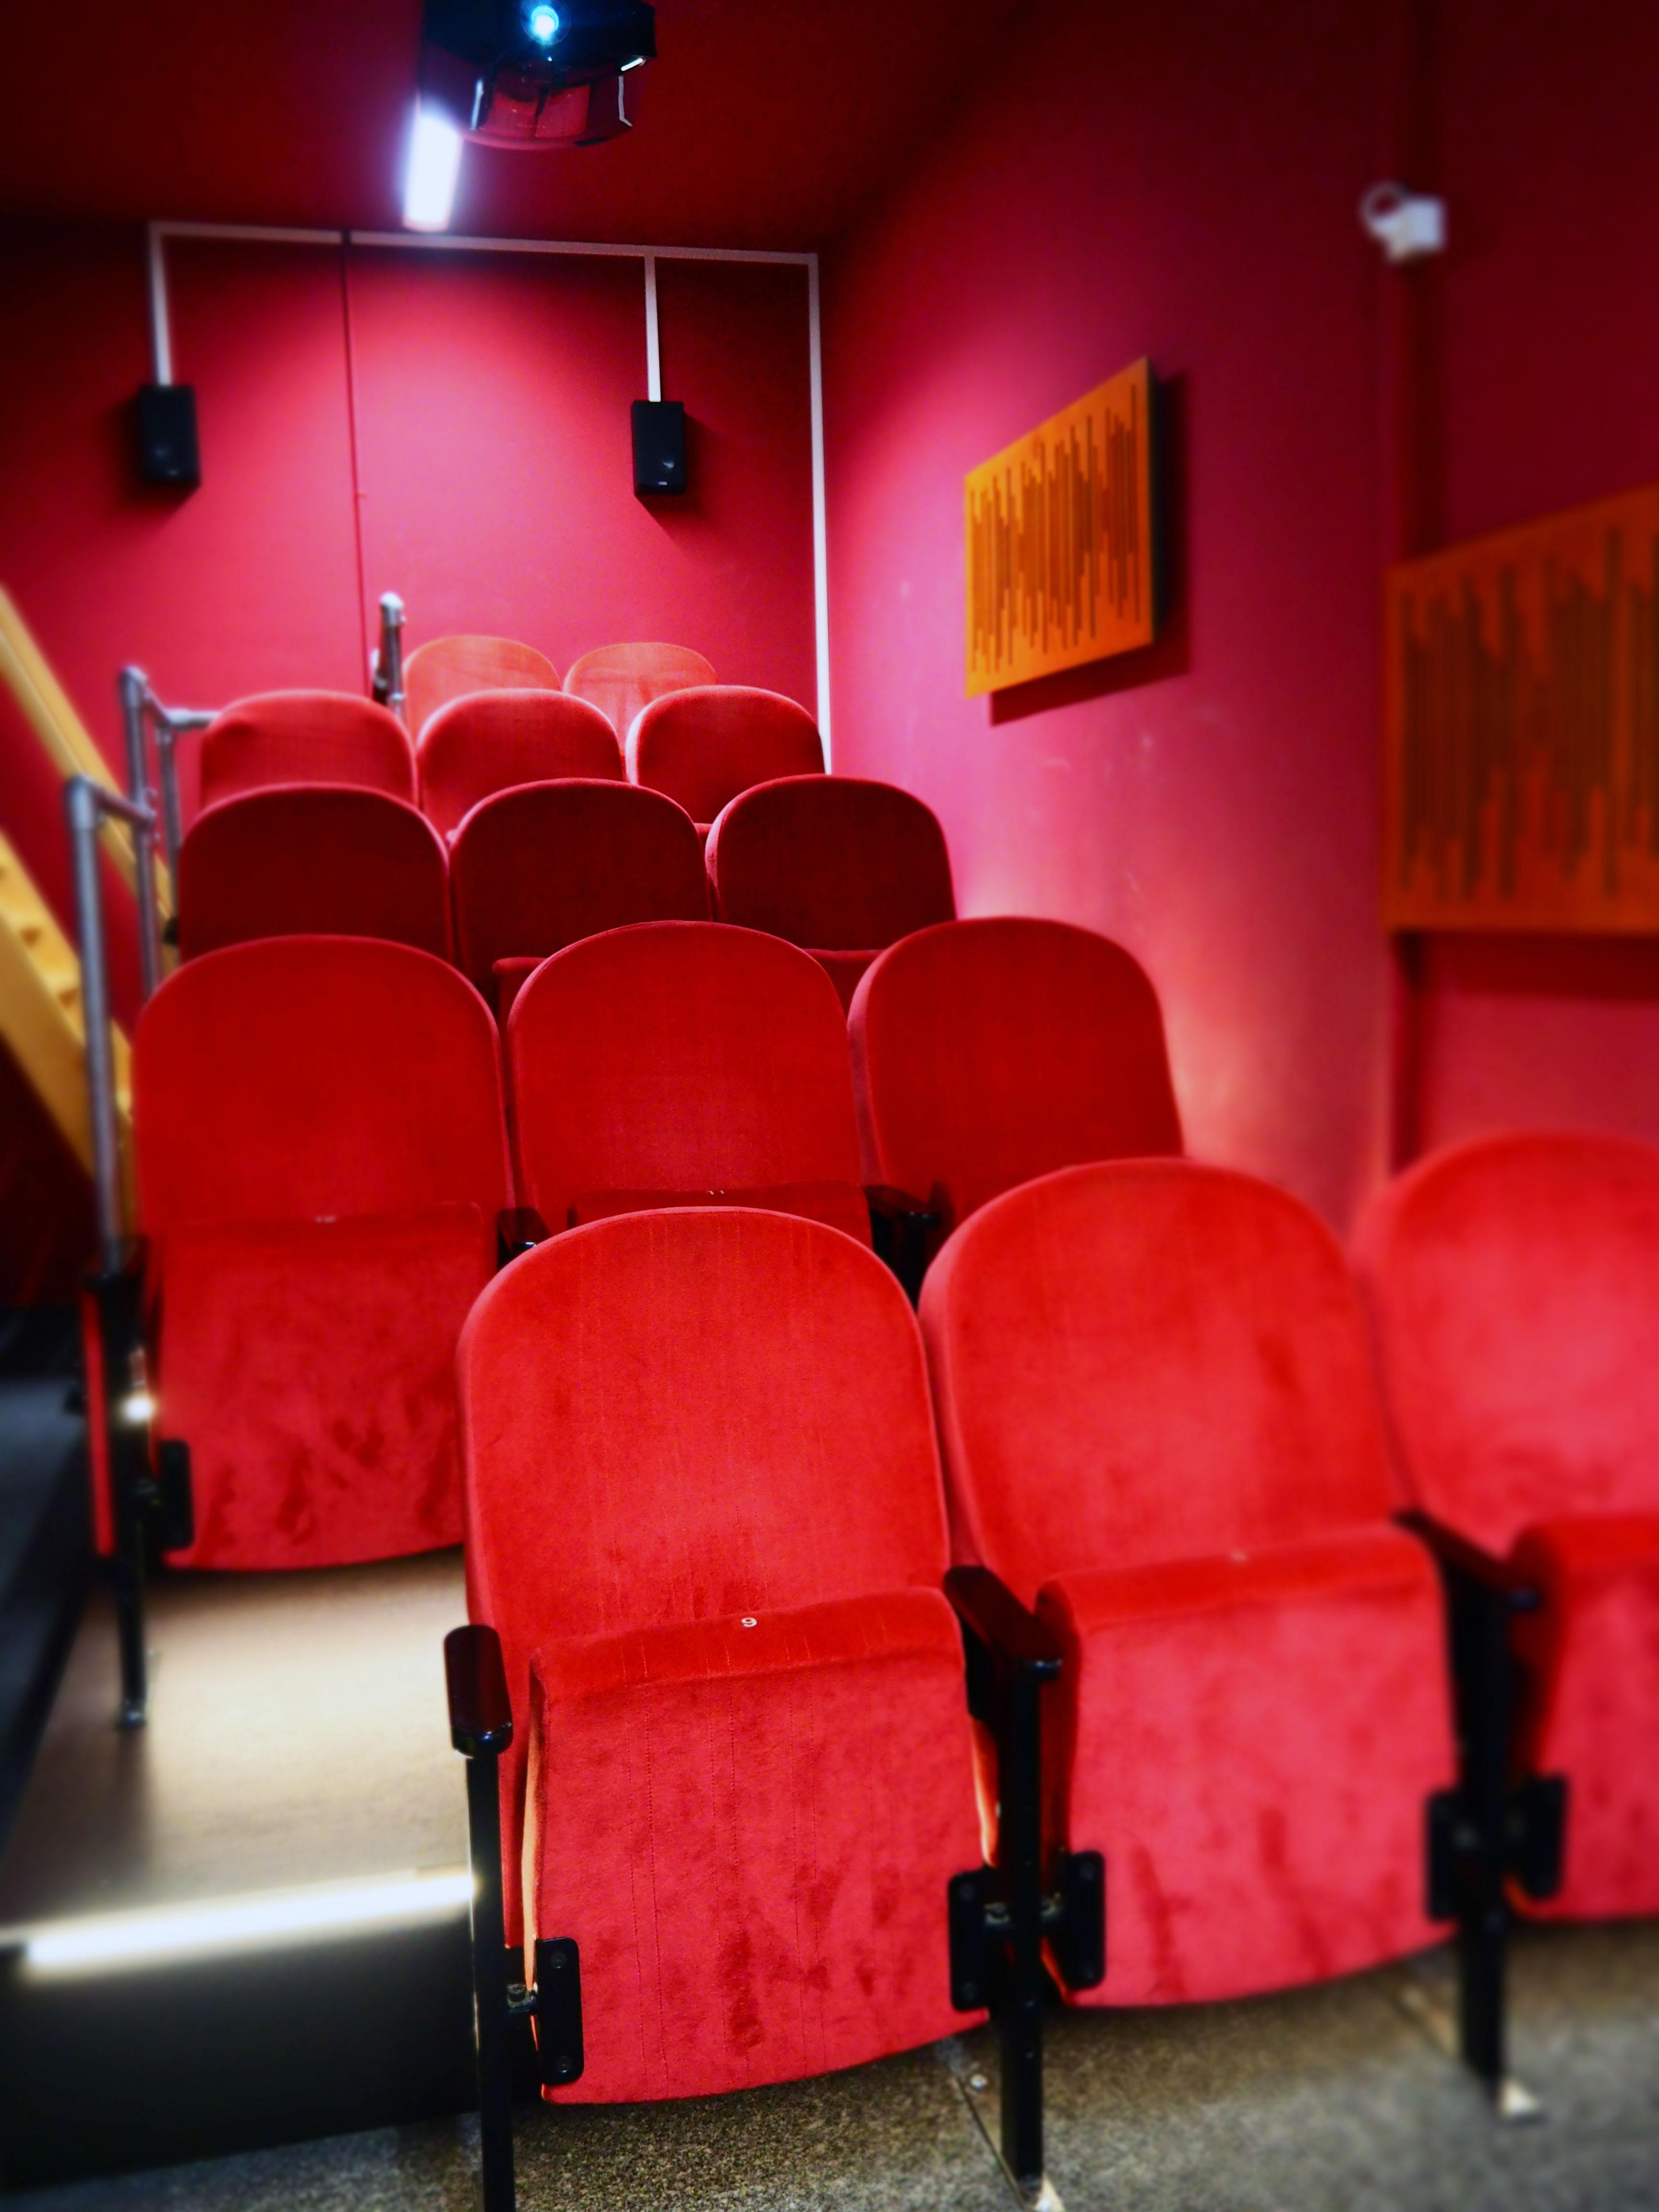 Kinoraum